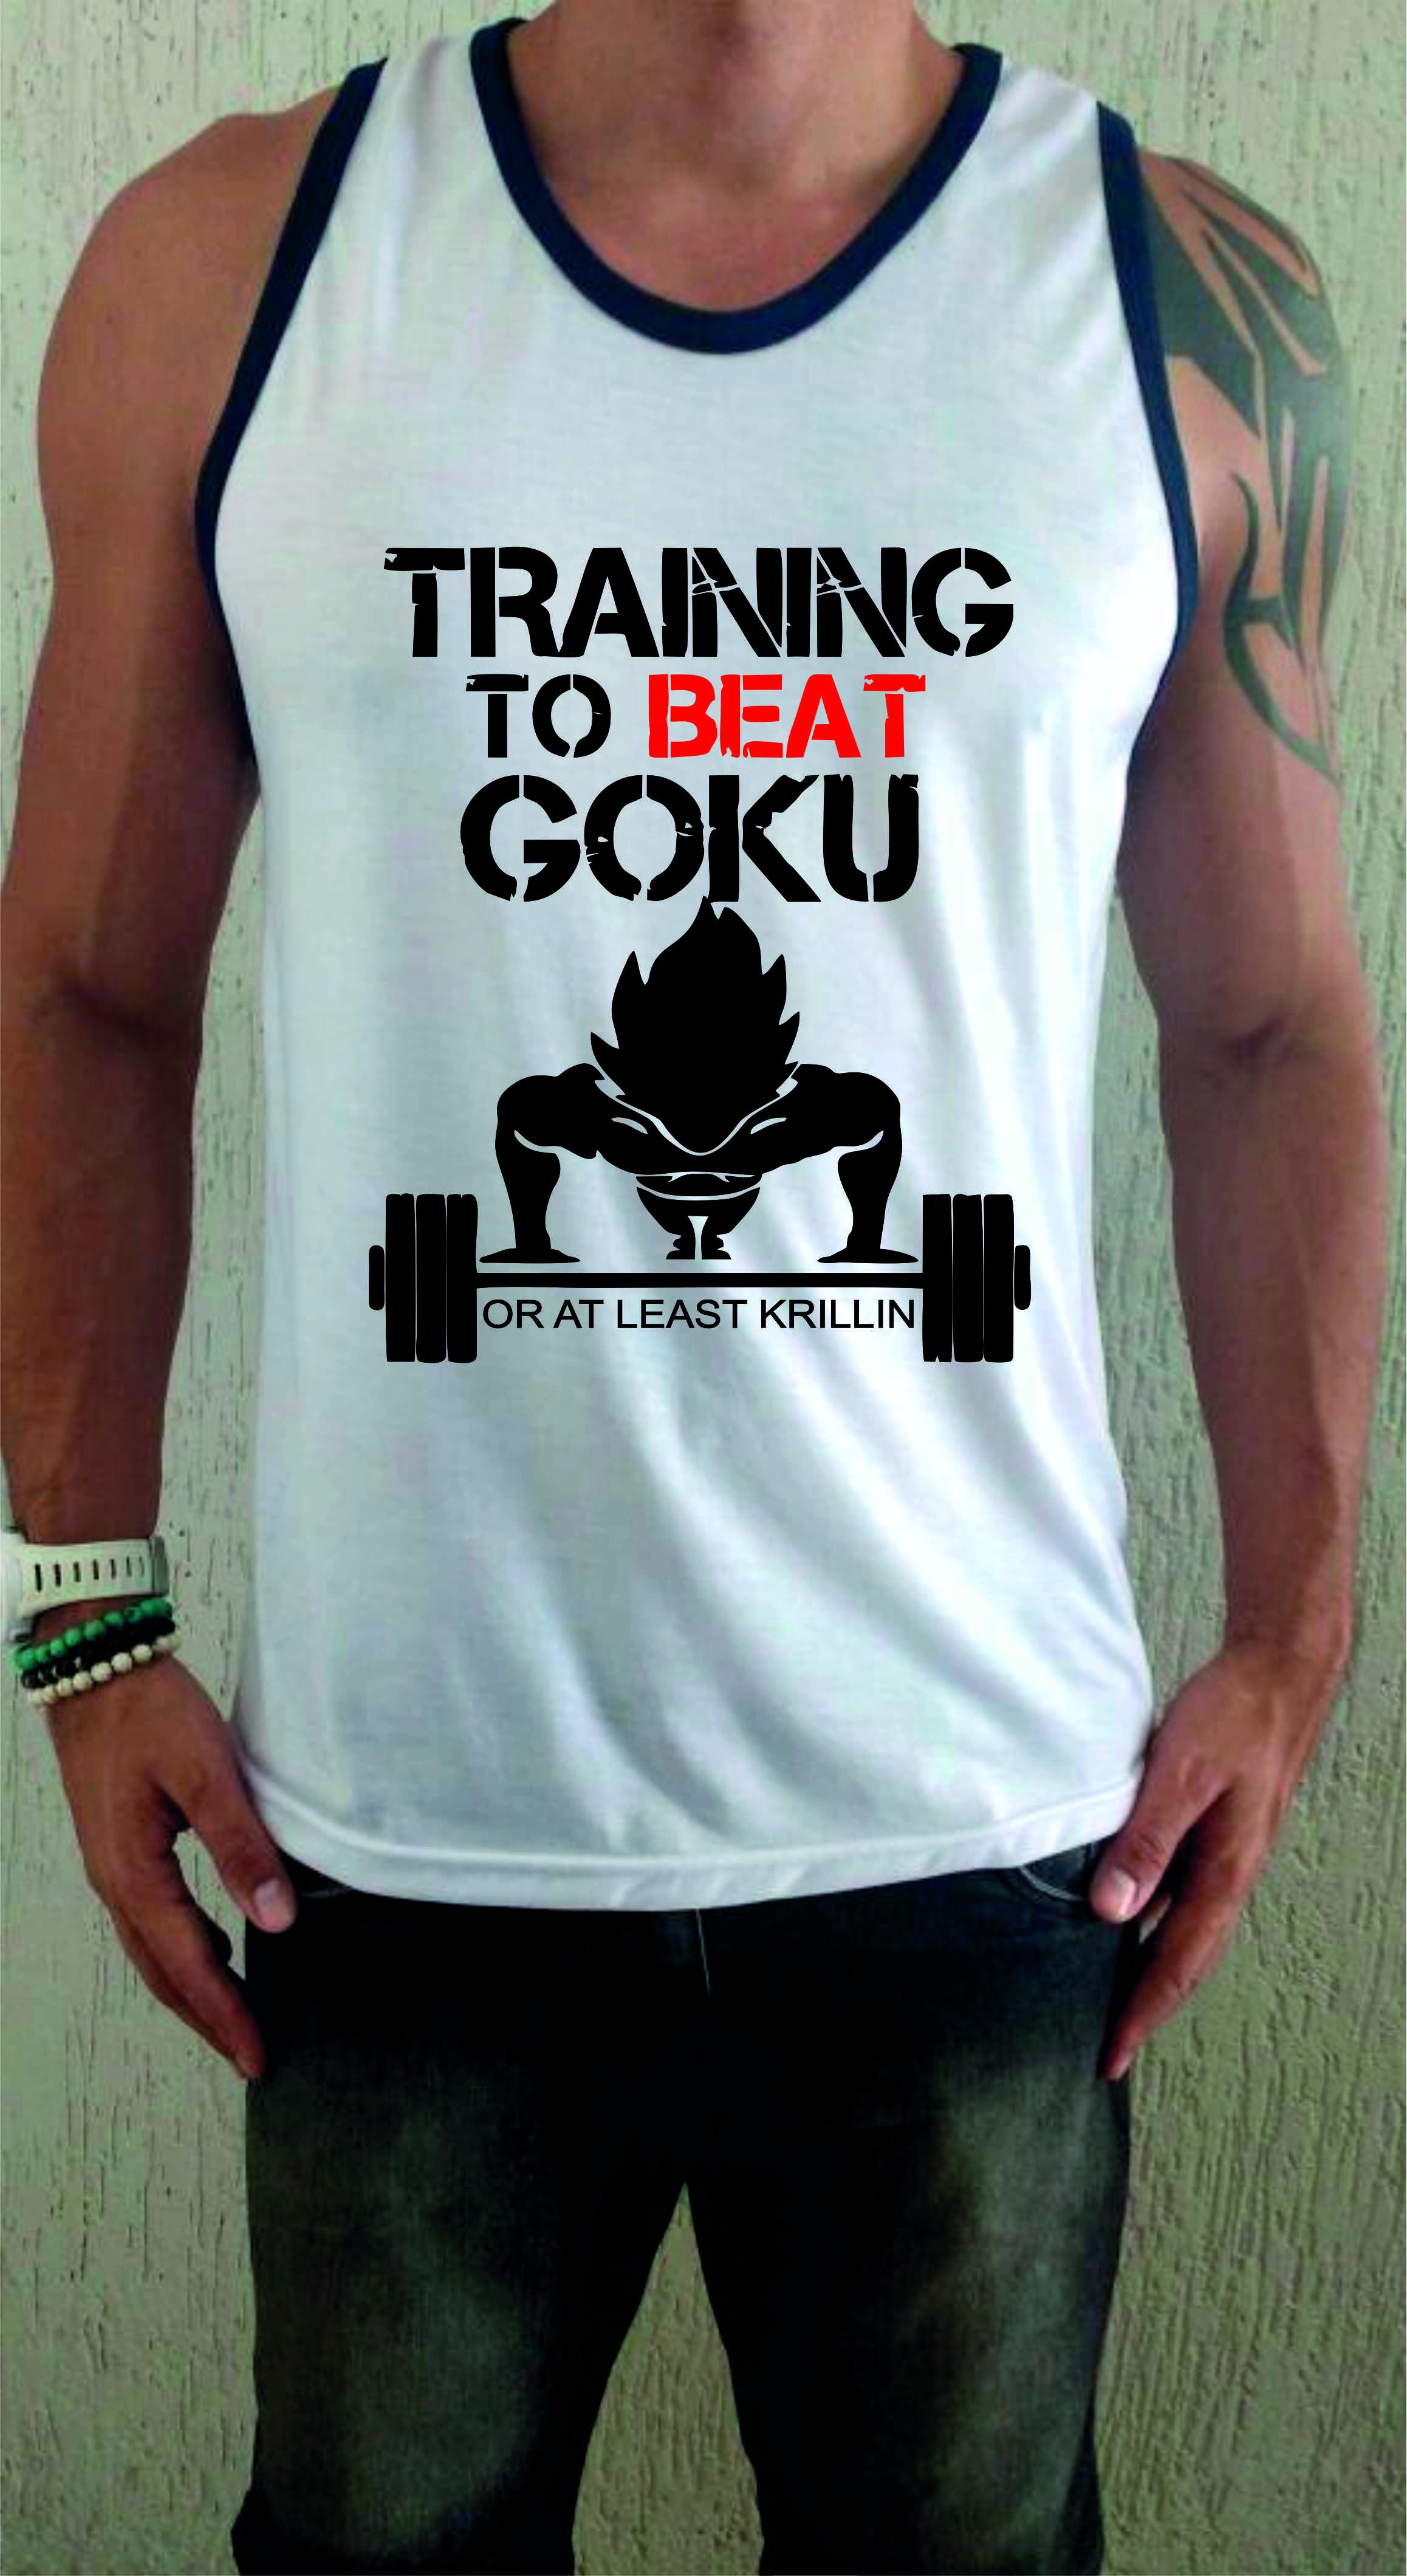 743db84d27a2a Camiseta Regata Academia Treino Goku no Elo7